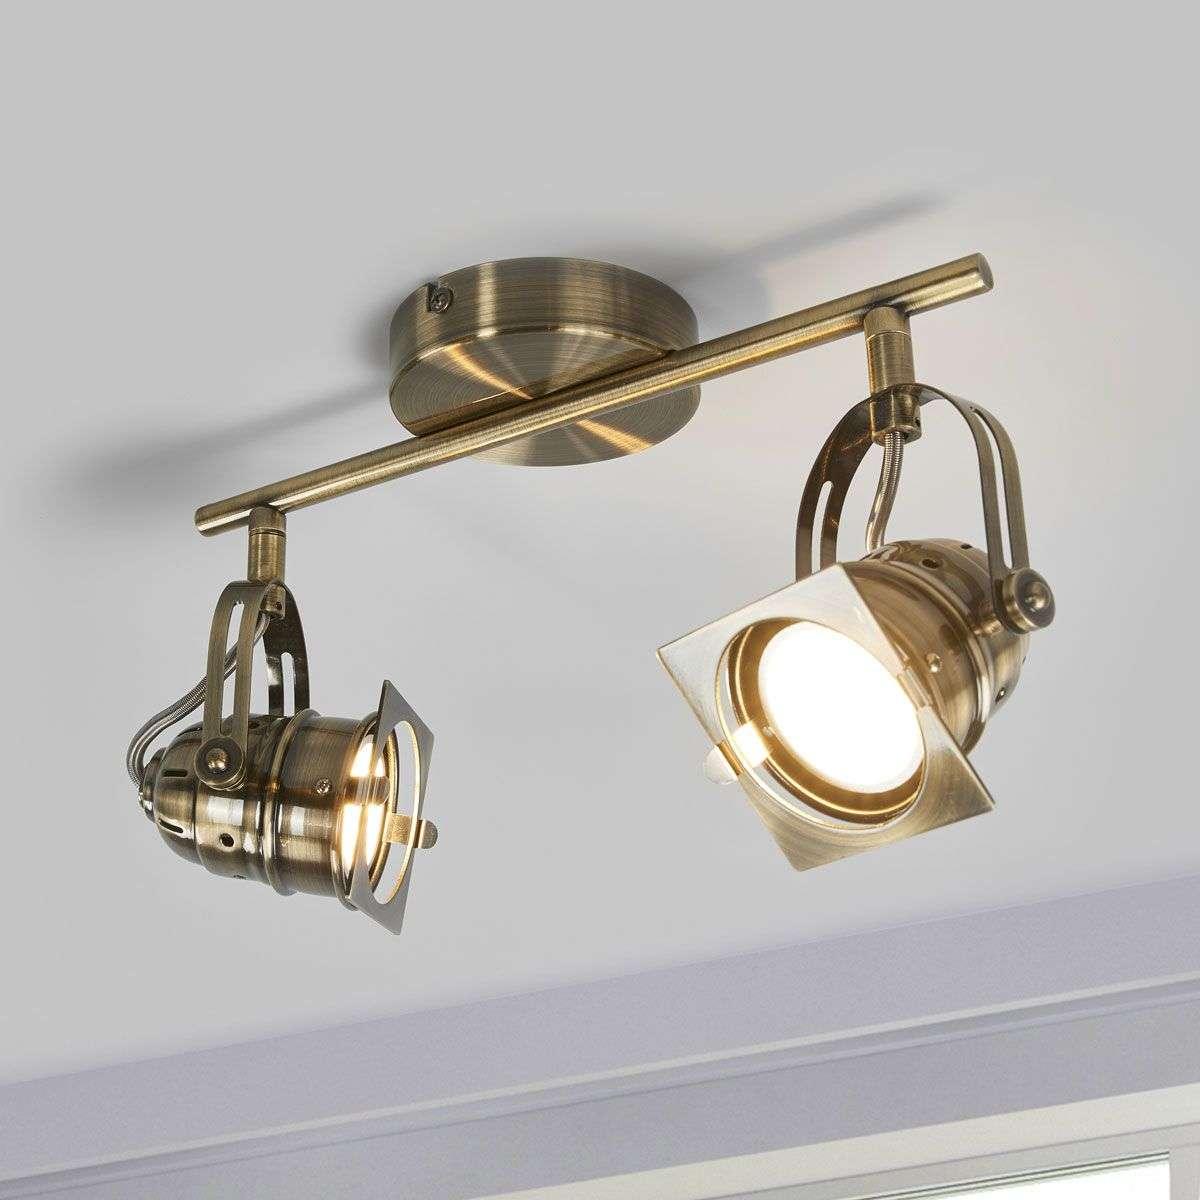 Antique brass coloured led ceiling lamp janek lights antique brass coloured led ceiling lamp janek 9639078 31 mozeypictures Choice Image